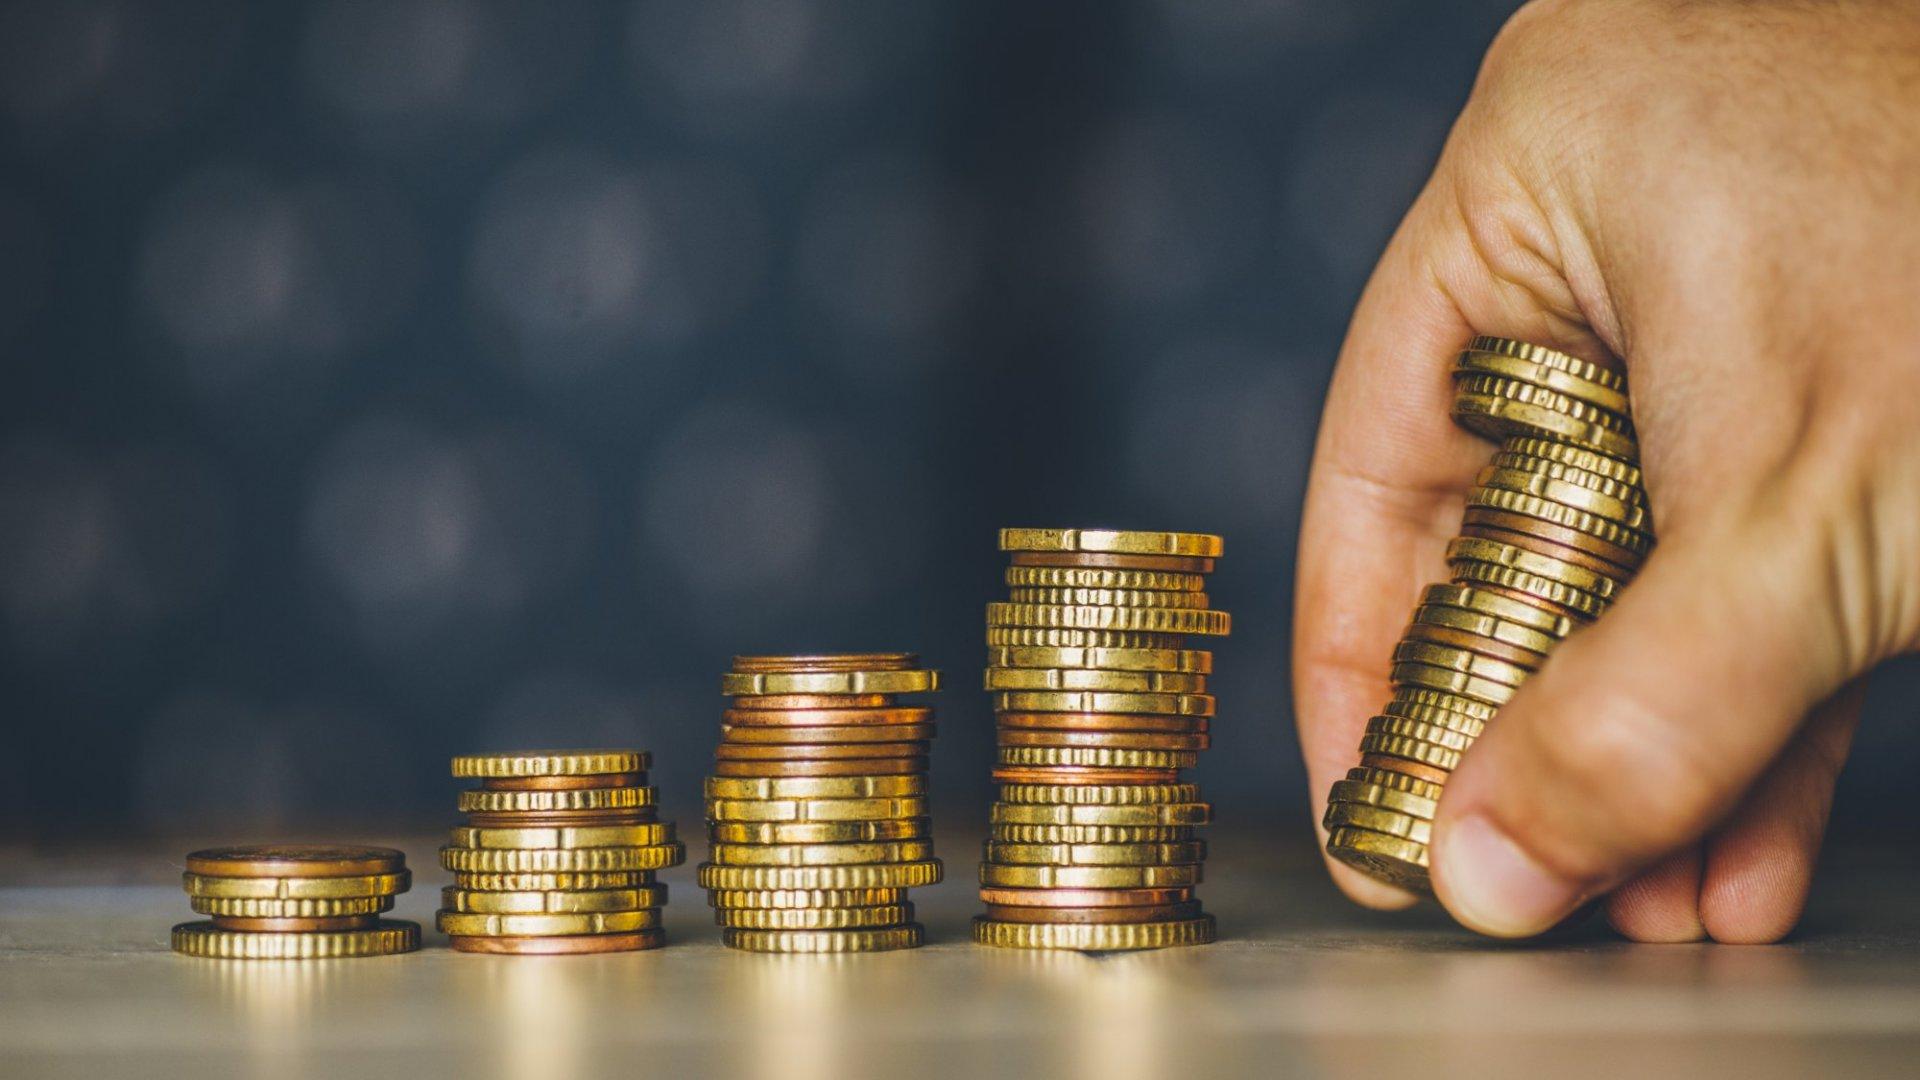 Identifying the True Value of Money